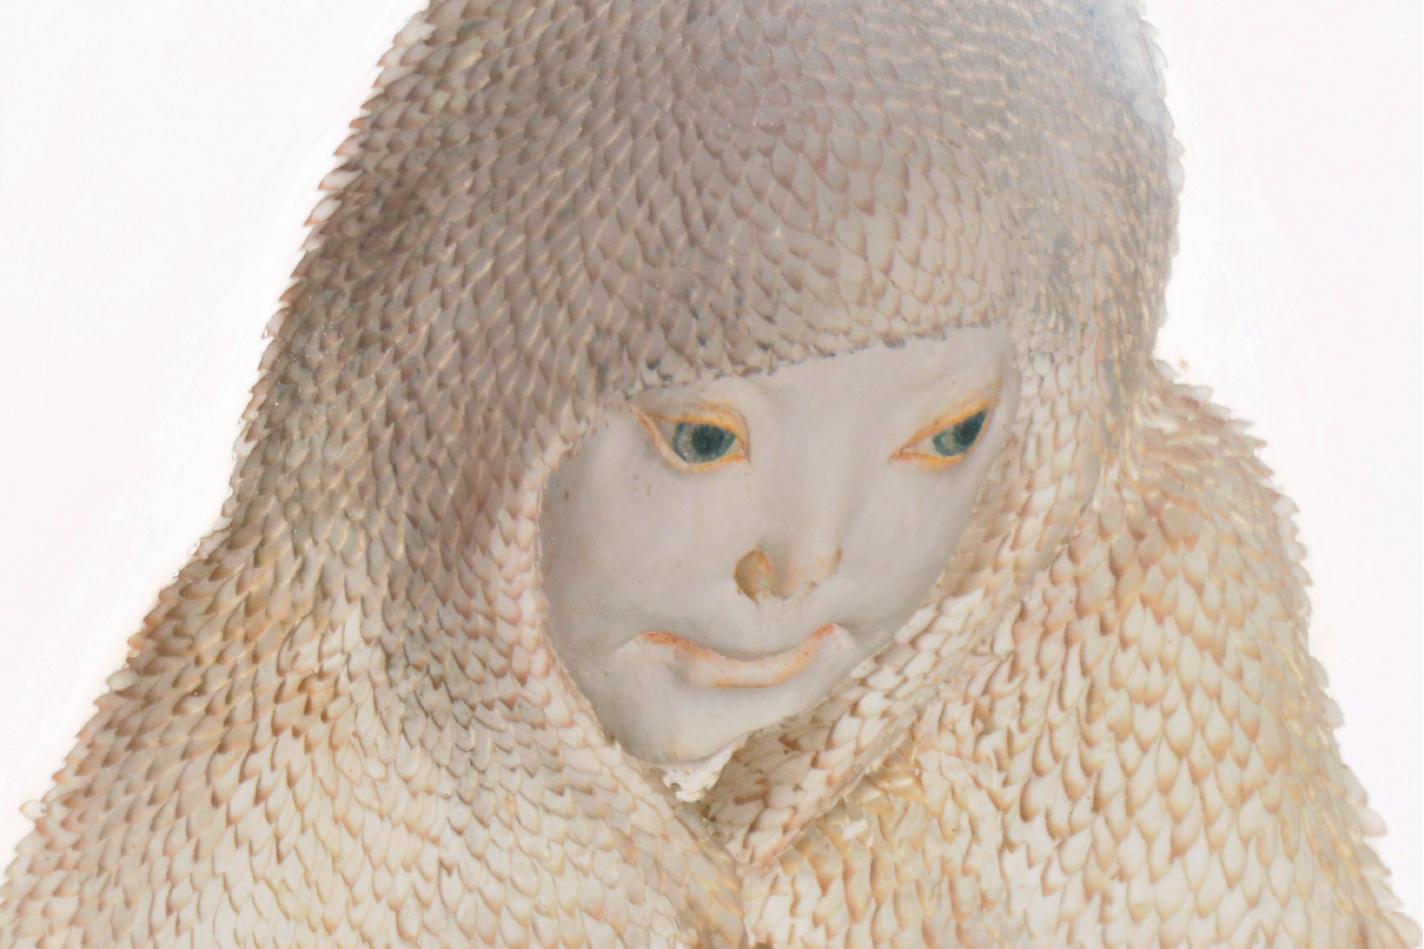 中谷ミチコ @ 神奈川県立近代美術館、葉山館